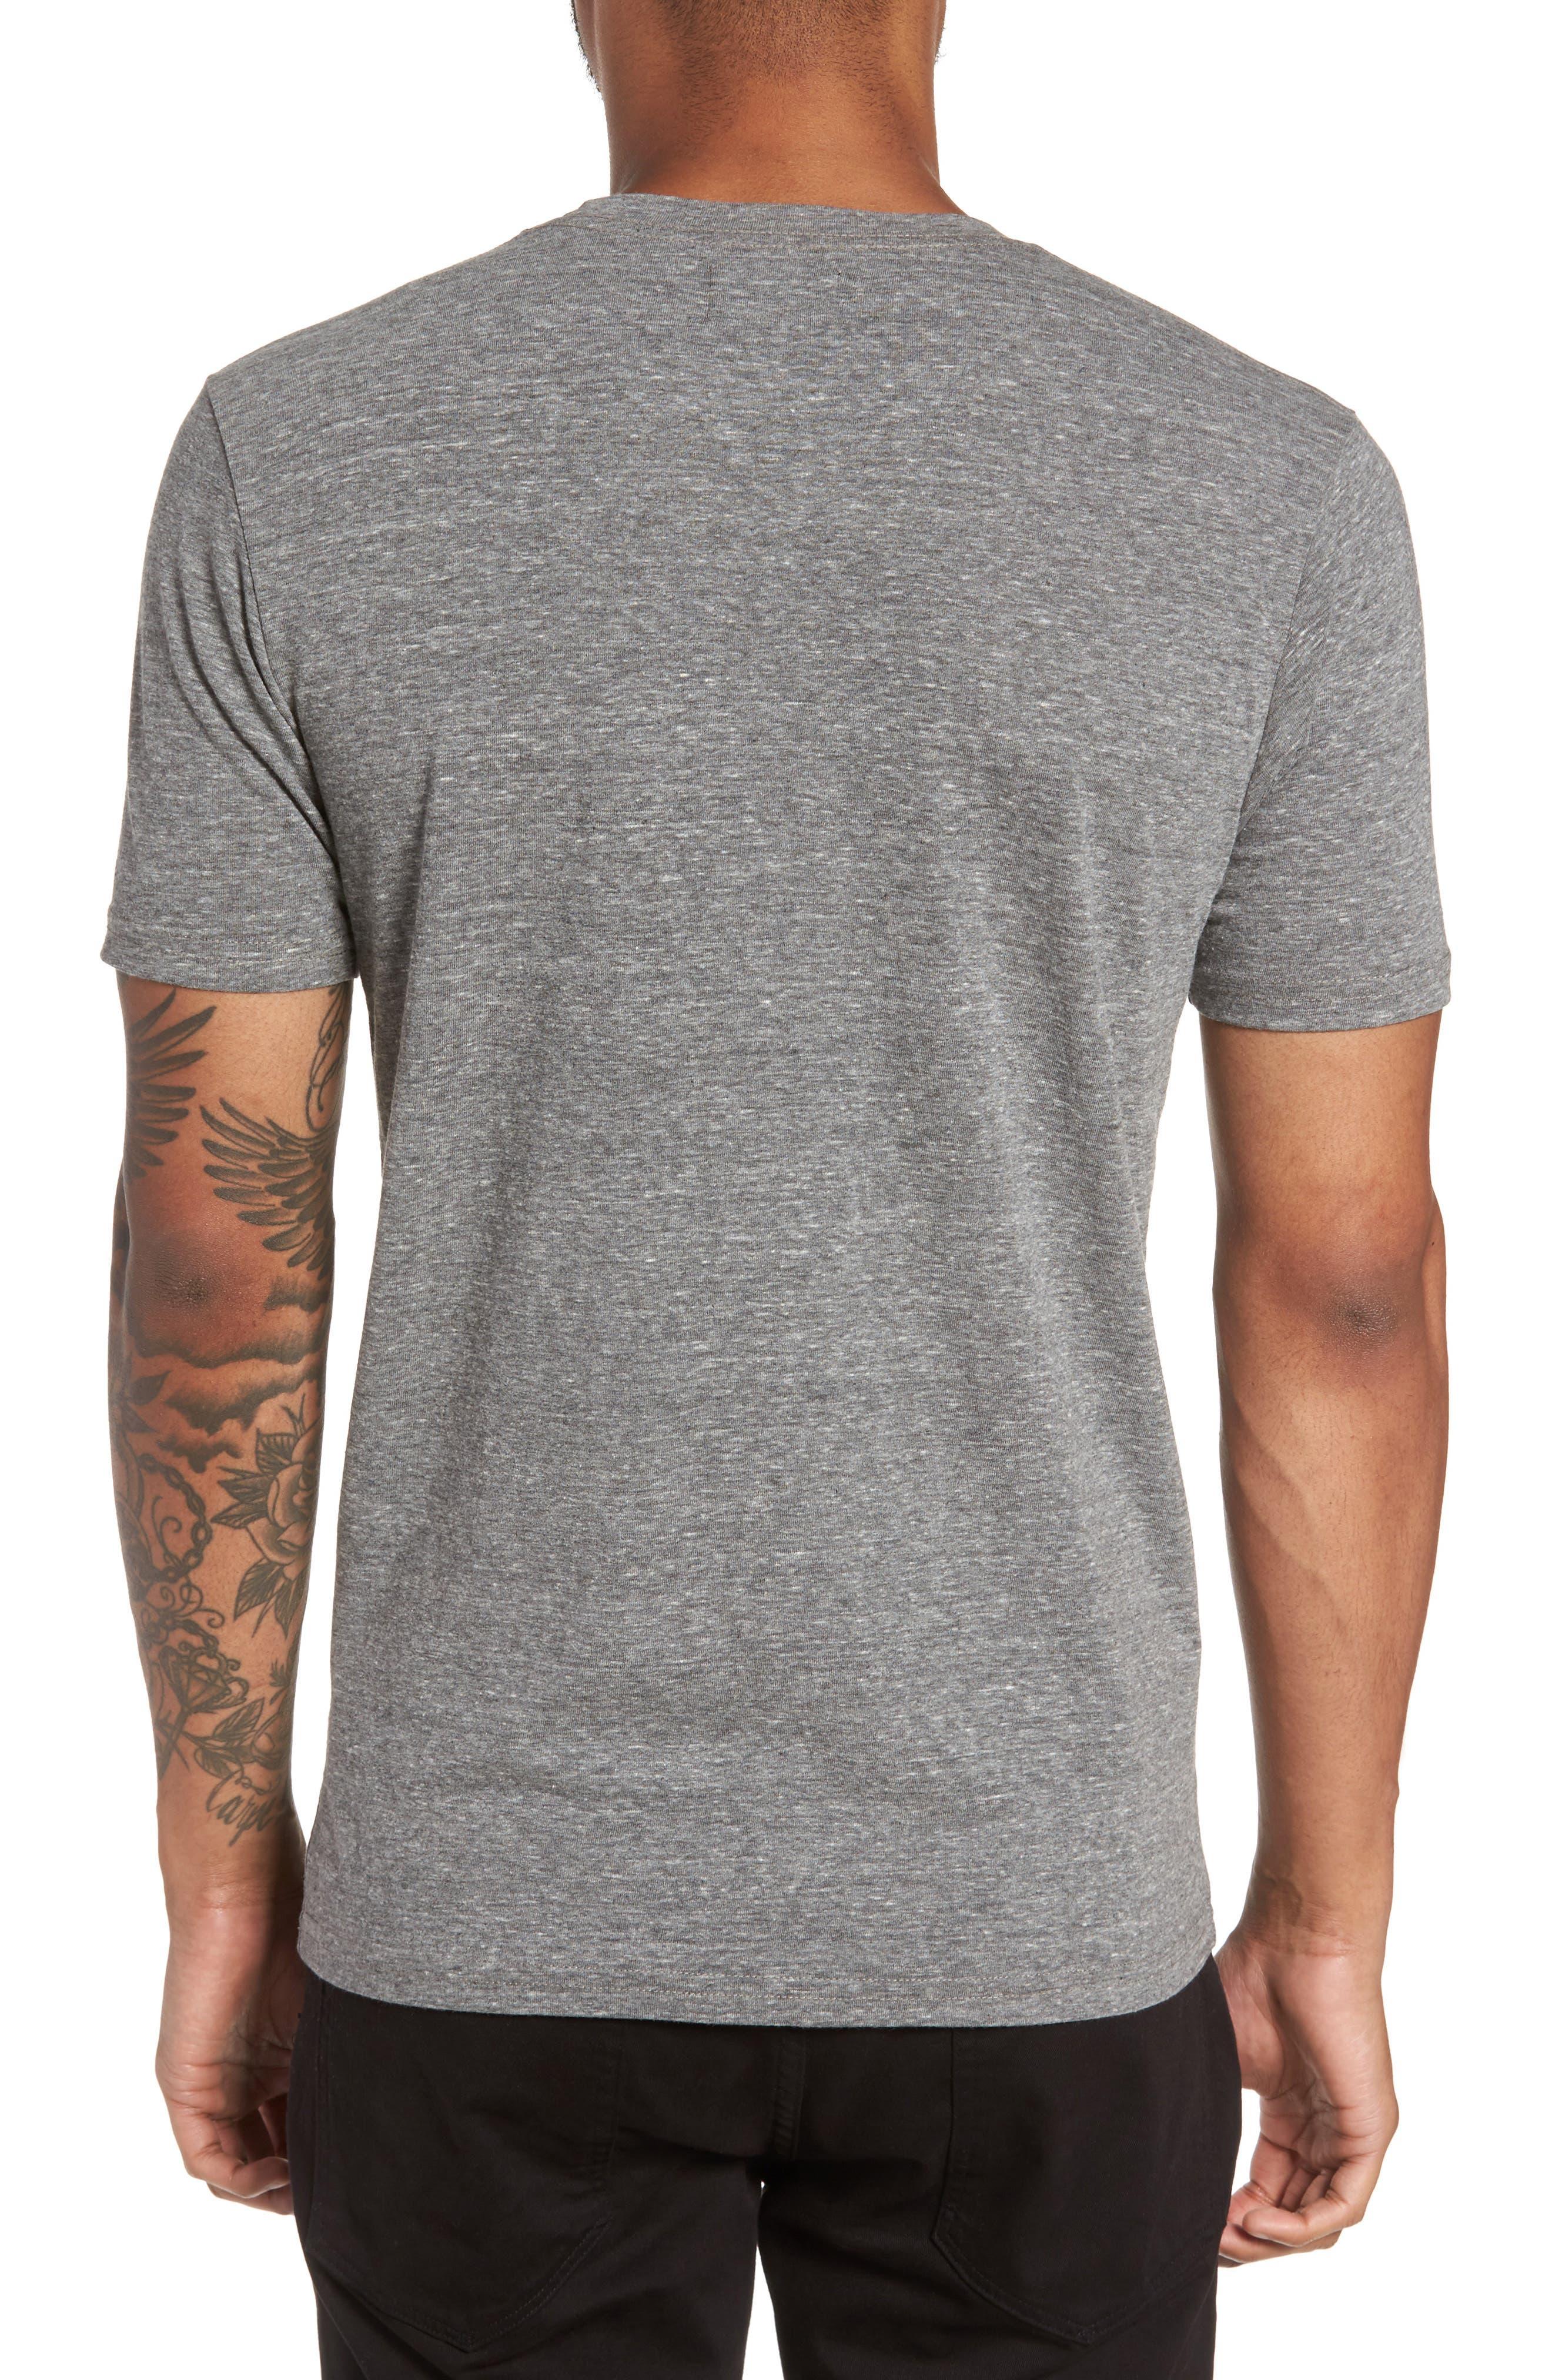 Supima Cotton Blend Crewneck T-Shirt,                             Alternate thumbnail 2, color,                             HEATHER GREY